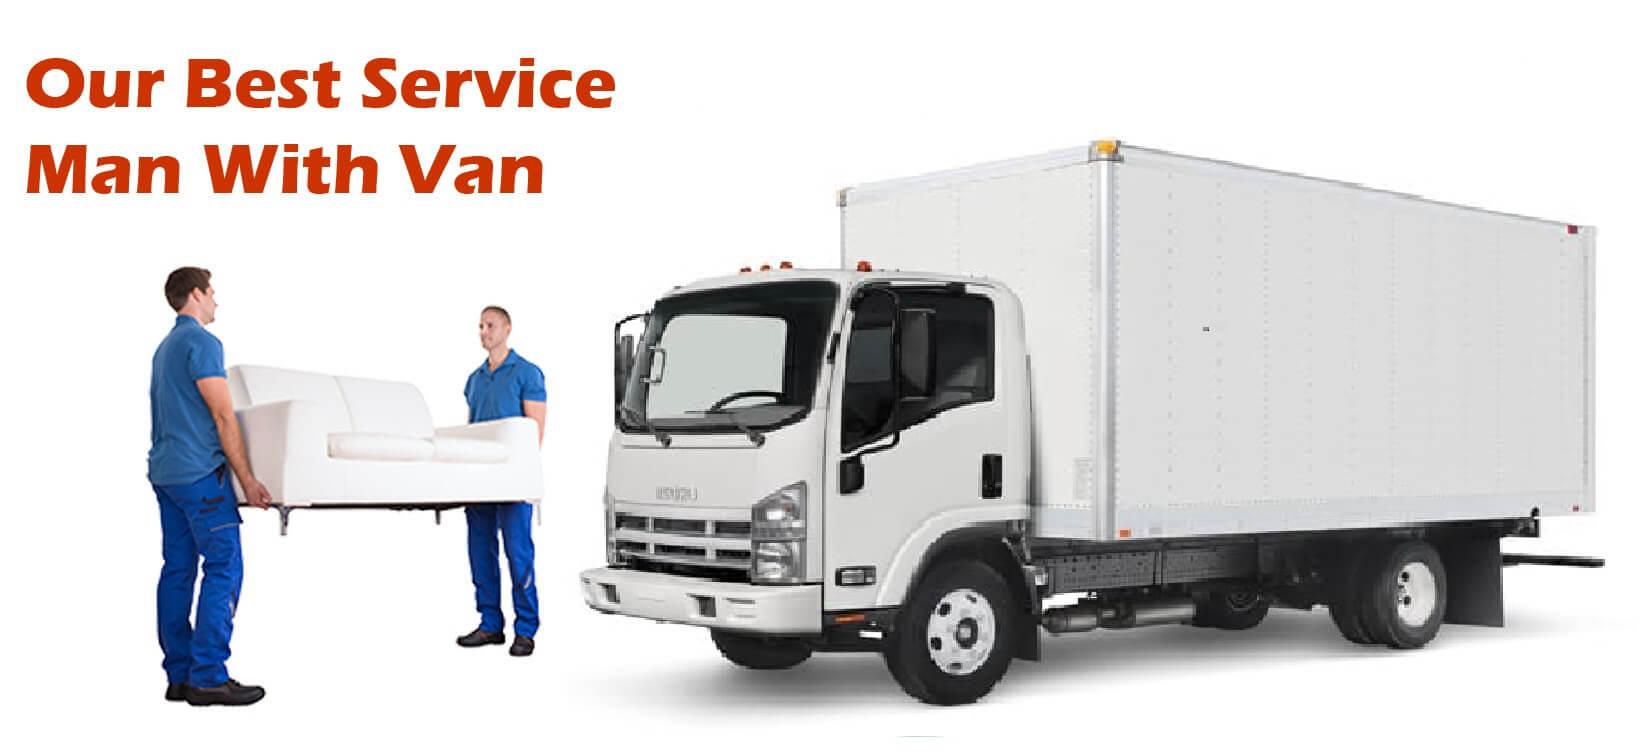 best-service-in-man-with-van-services-in-dubai_